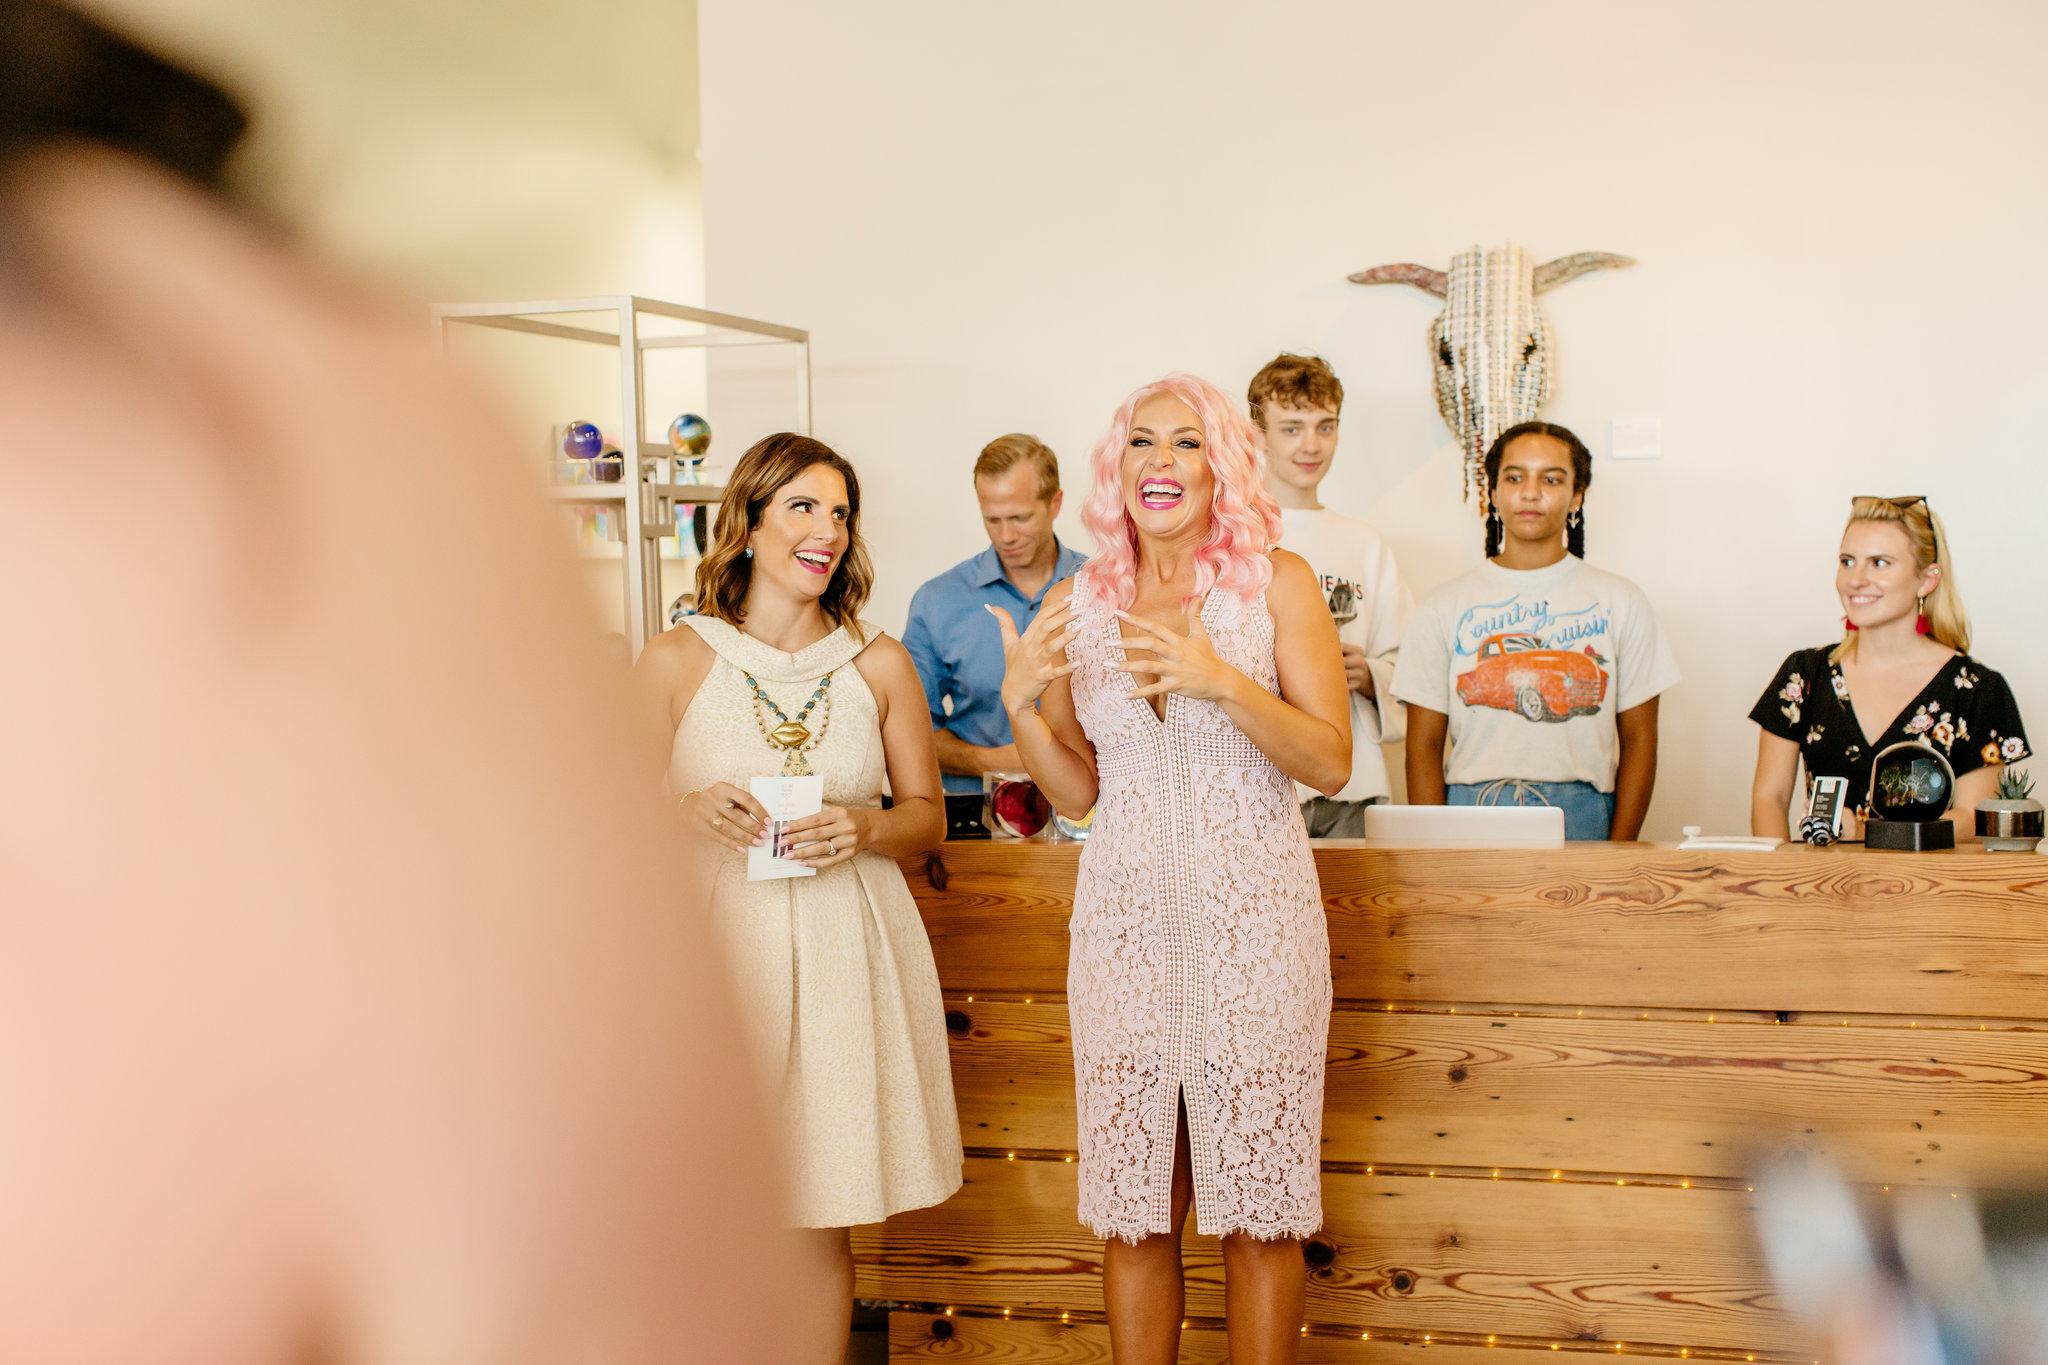 Alexa-Vossler-Photo_Dallas-Event-Photographer_Brite-Bar-Beauty-2018-Lipstick-Launch-Party-94.jpg